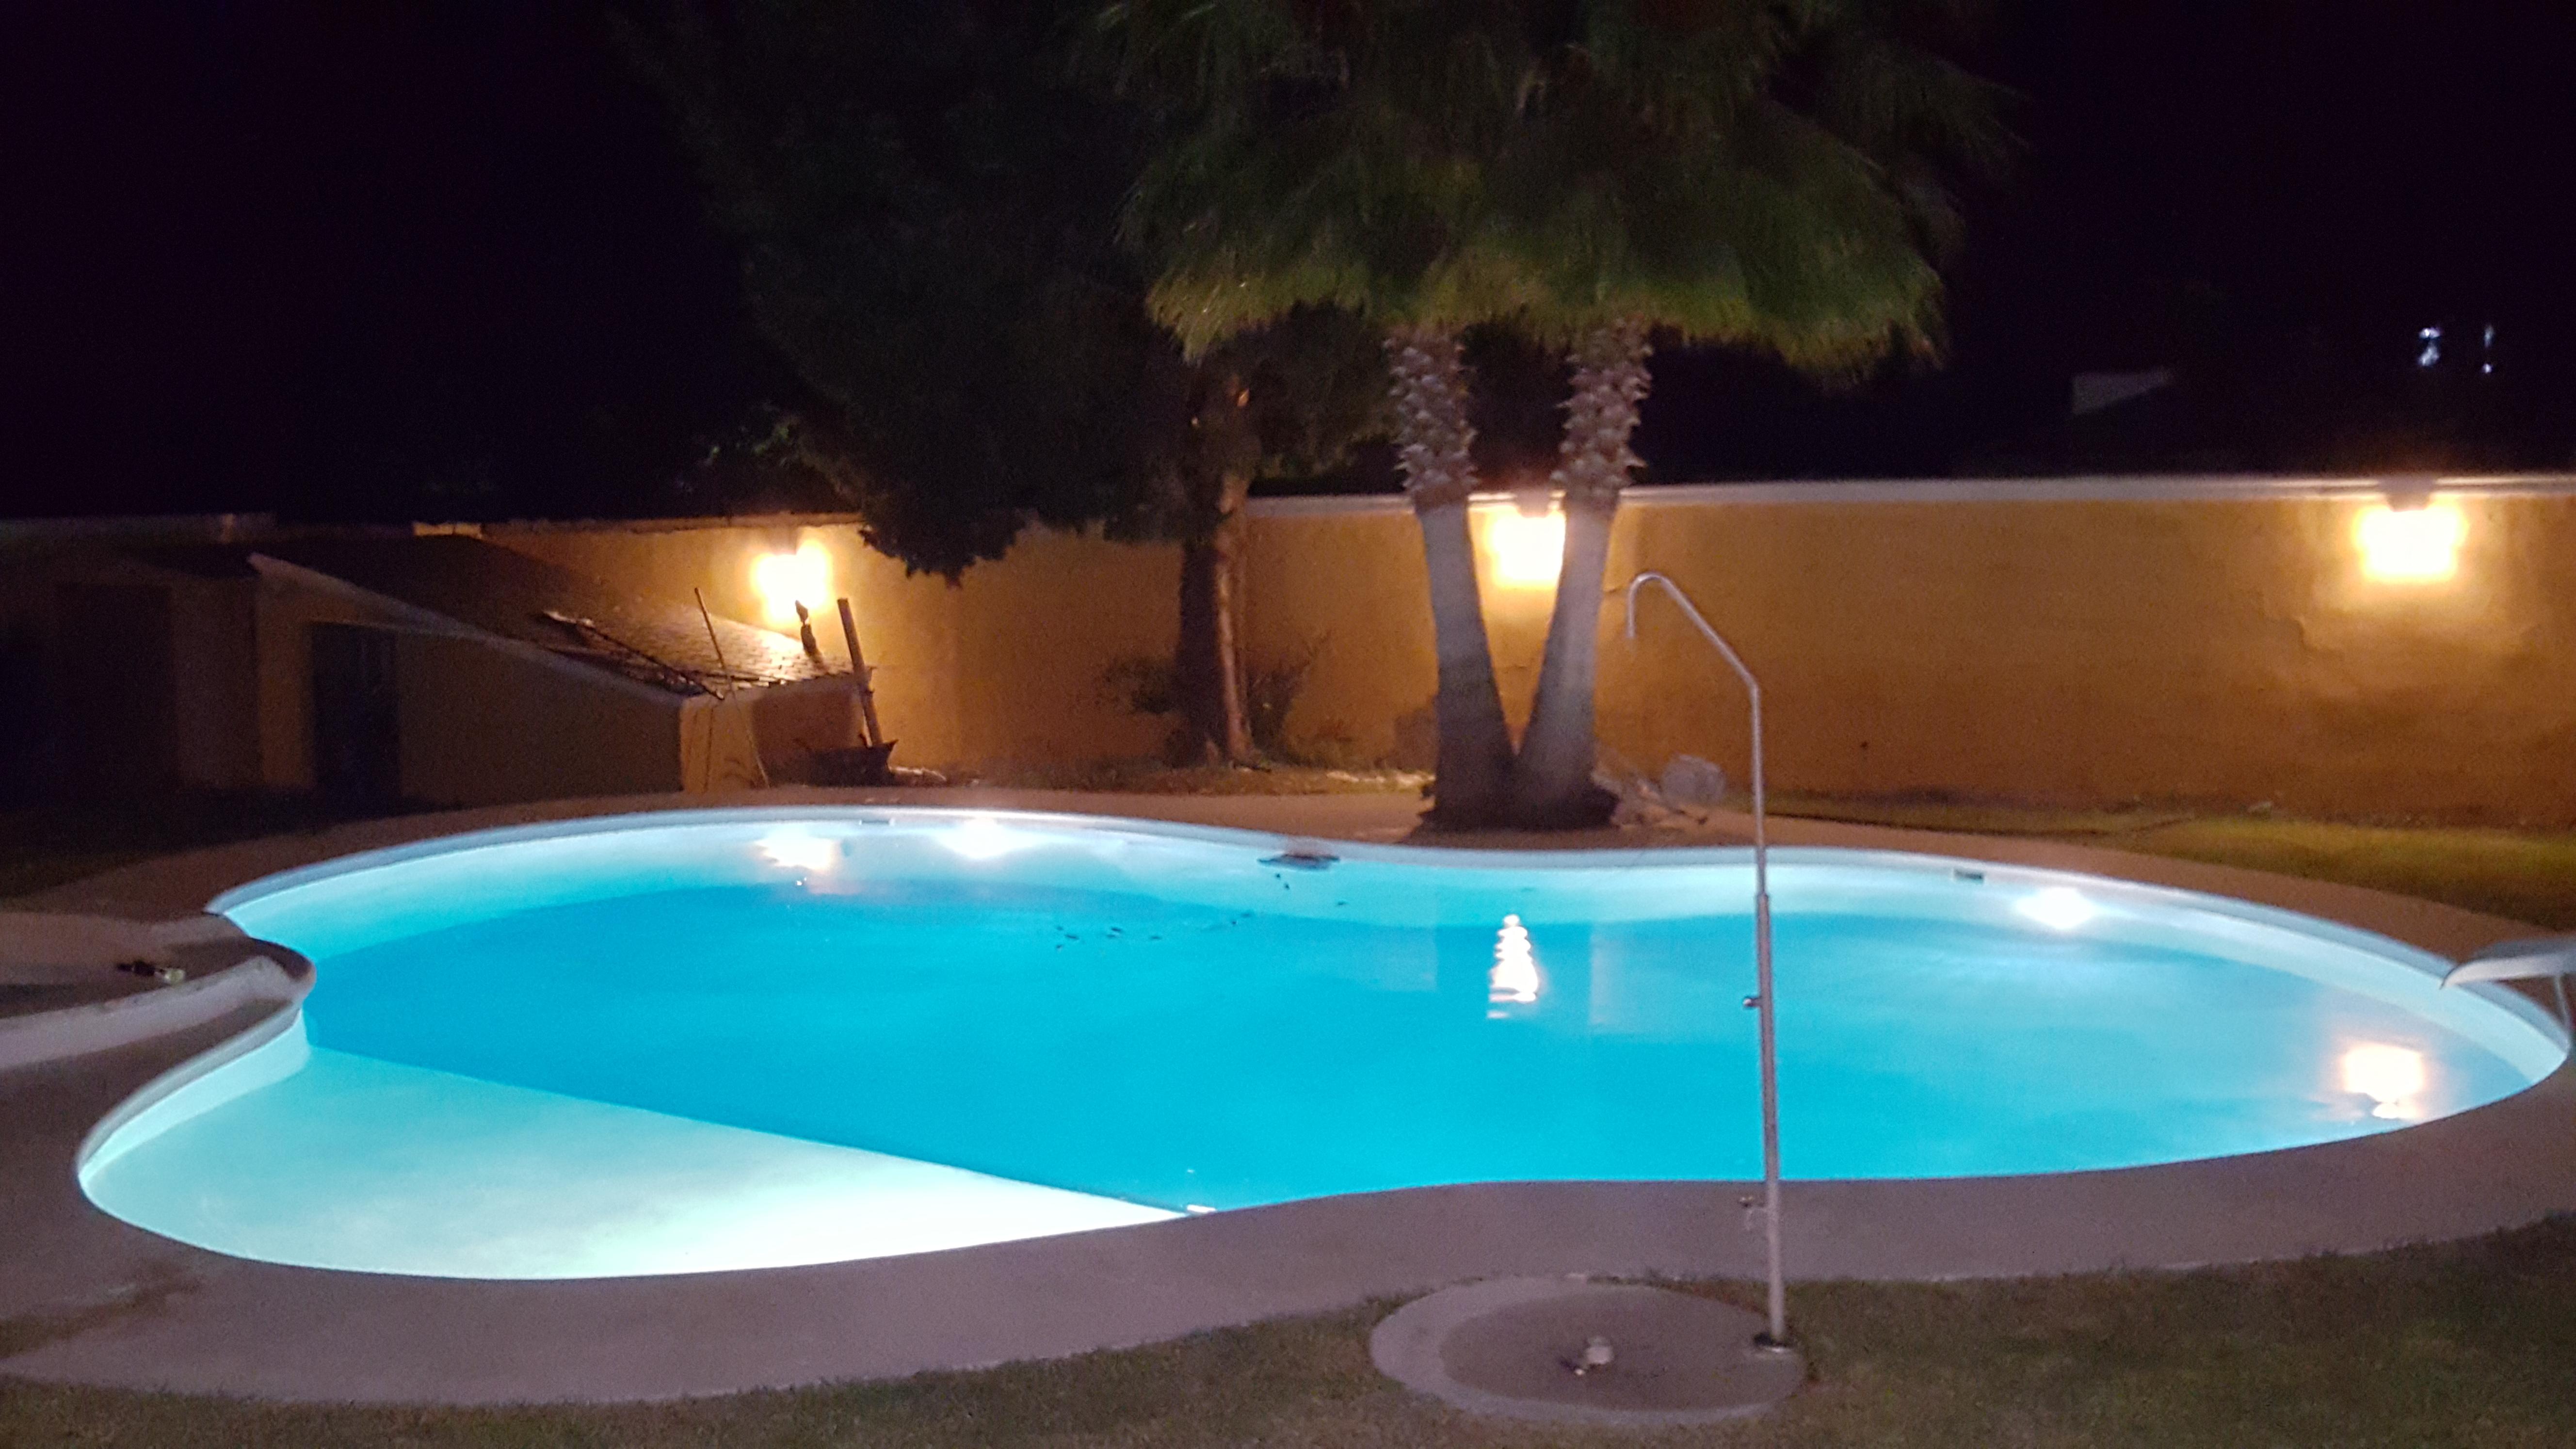 20150507 230755 construcci n de piscinas for Barrefondos piscina